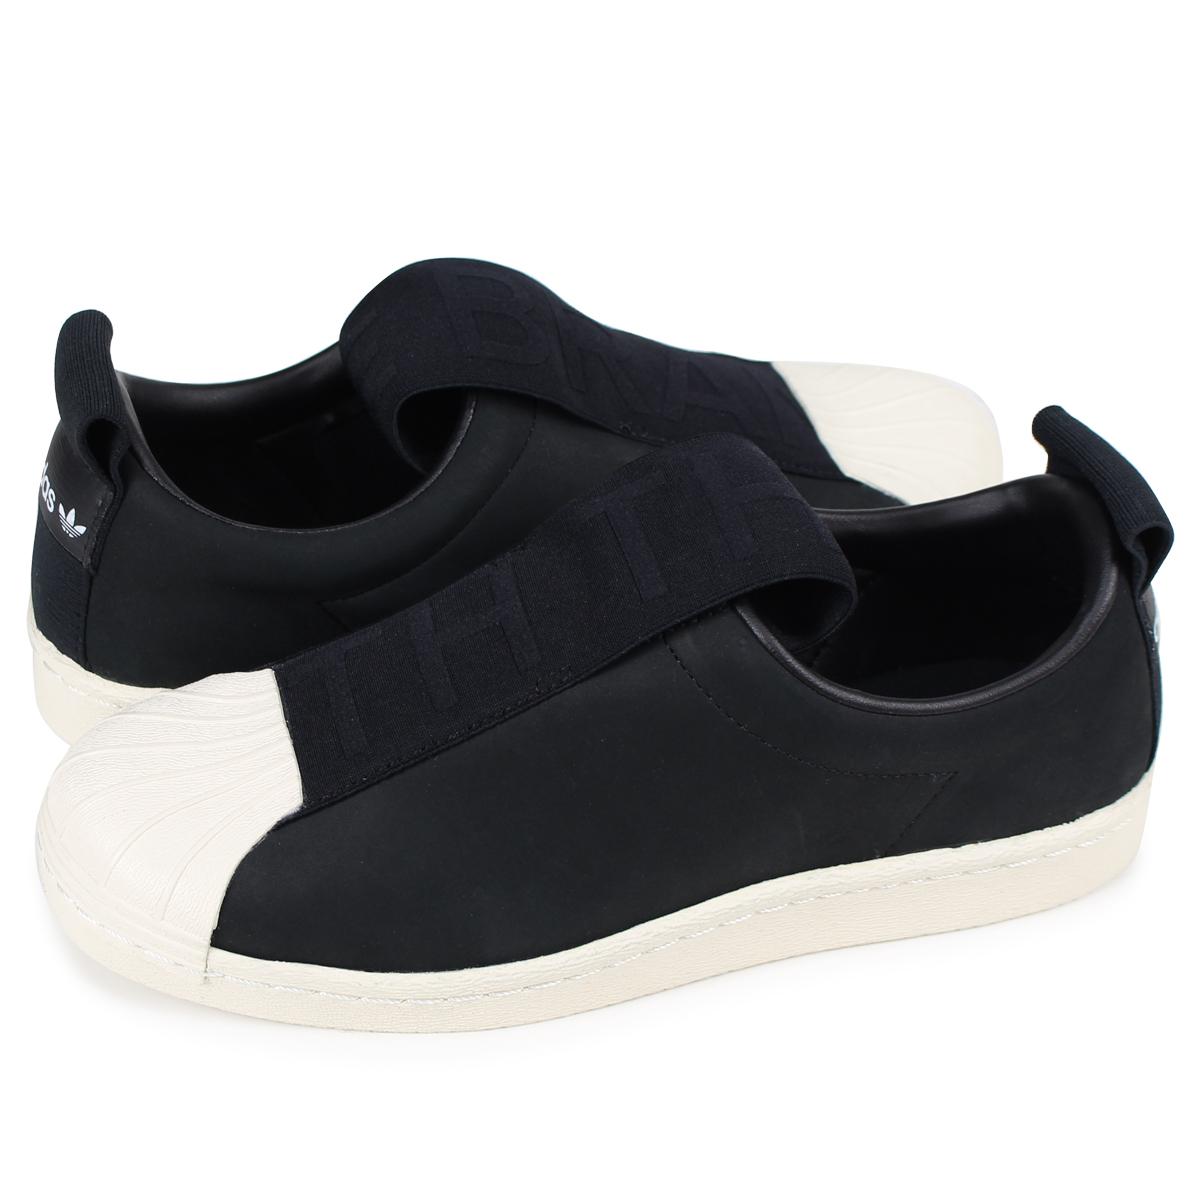 reputable site ada2b 121fd adidas Originals SUPERSTAR BW3S SLIPON W superstar Adidas Lady's slip-ons  sneakers CQ2517 black originals